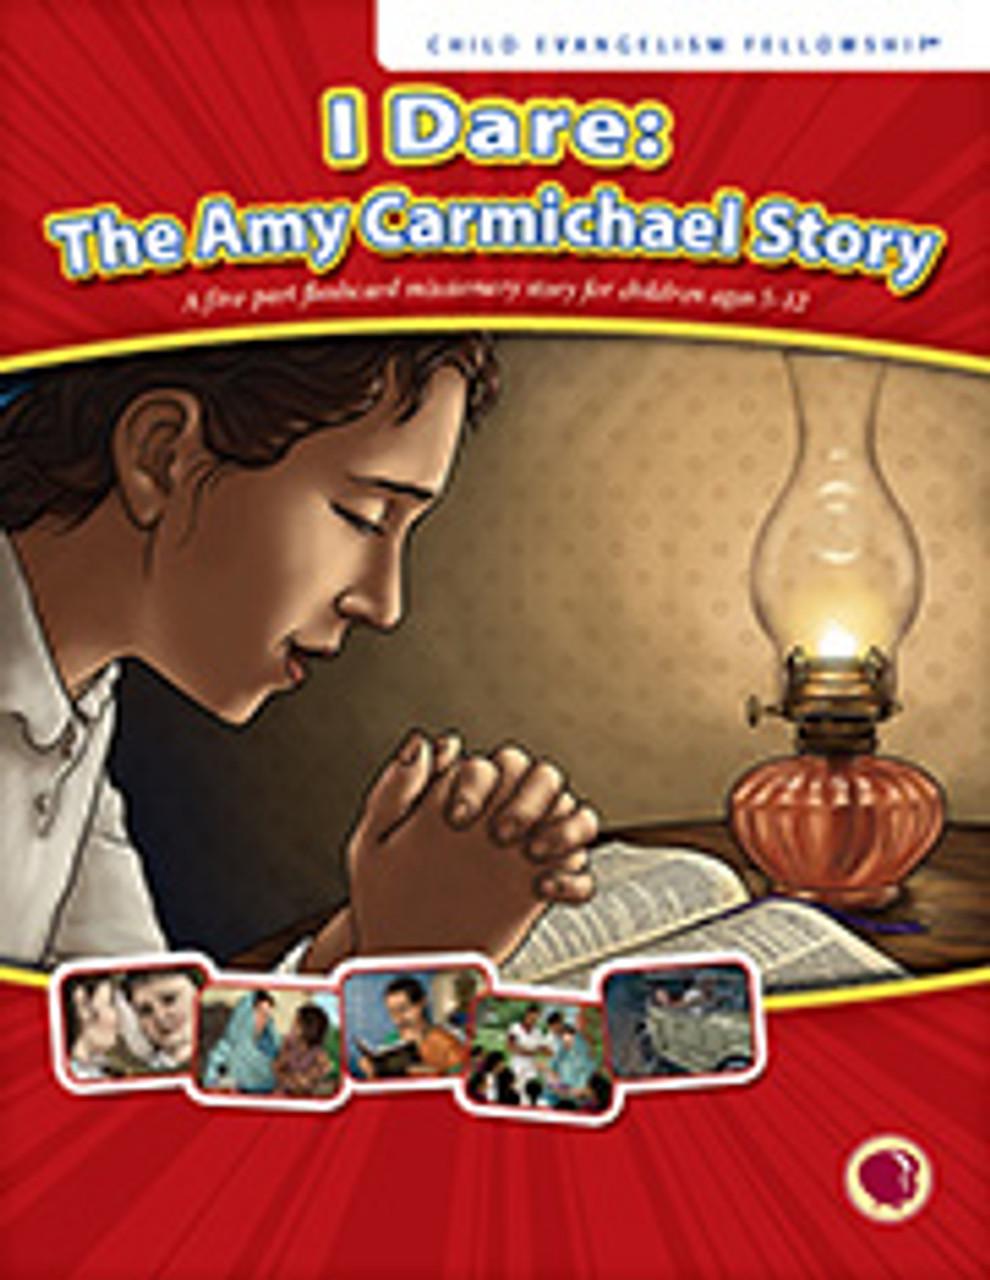 I Dare: The Amy Carmichael Story 2016 (teachers manual)